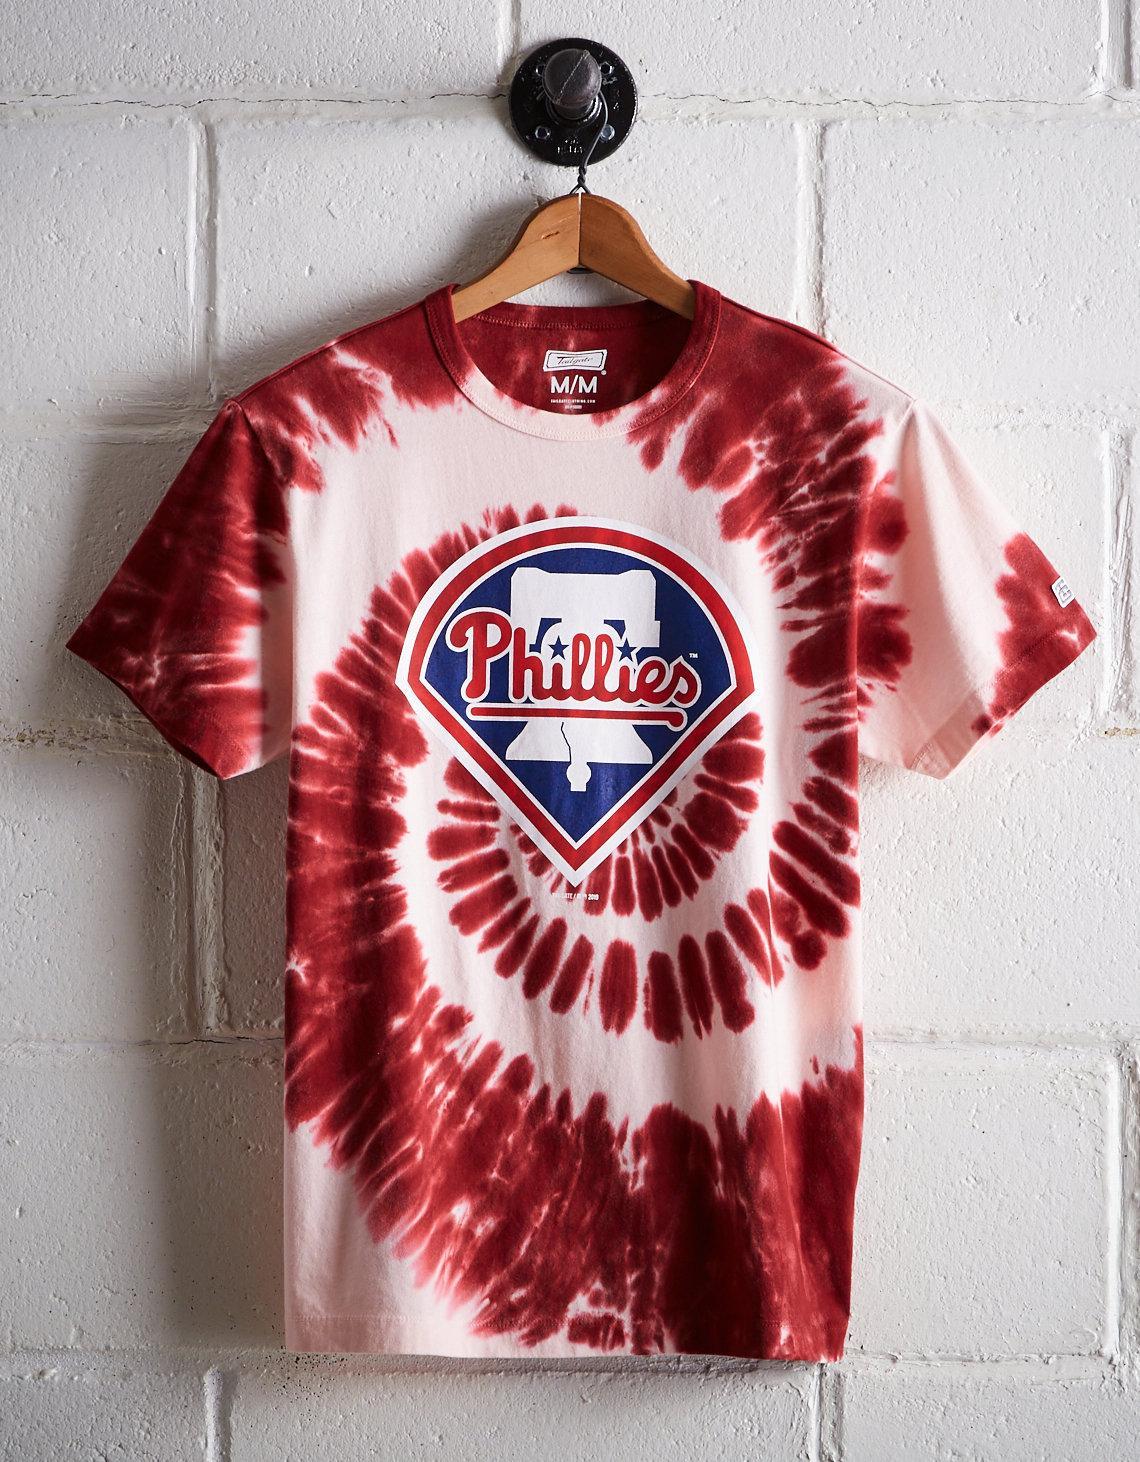 611a2564 Lyst - Tailgate Men's Philadelphia Phillies Tie-dye T-shirt in Red ...